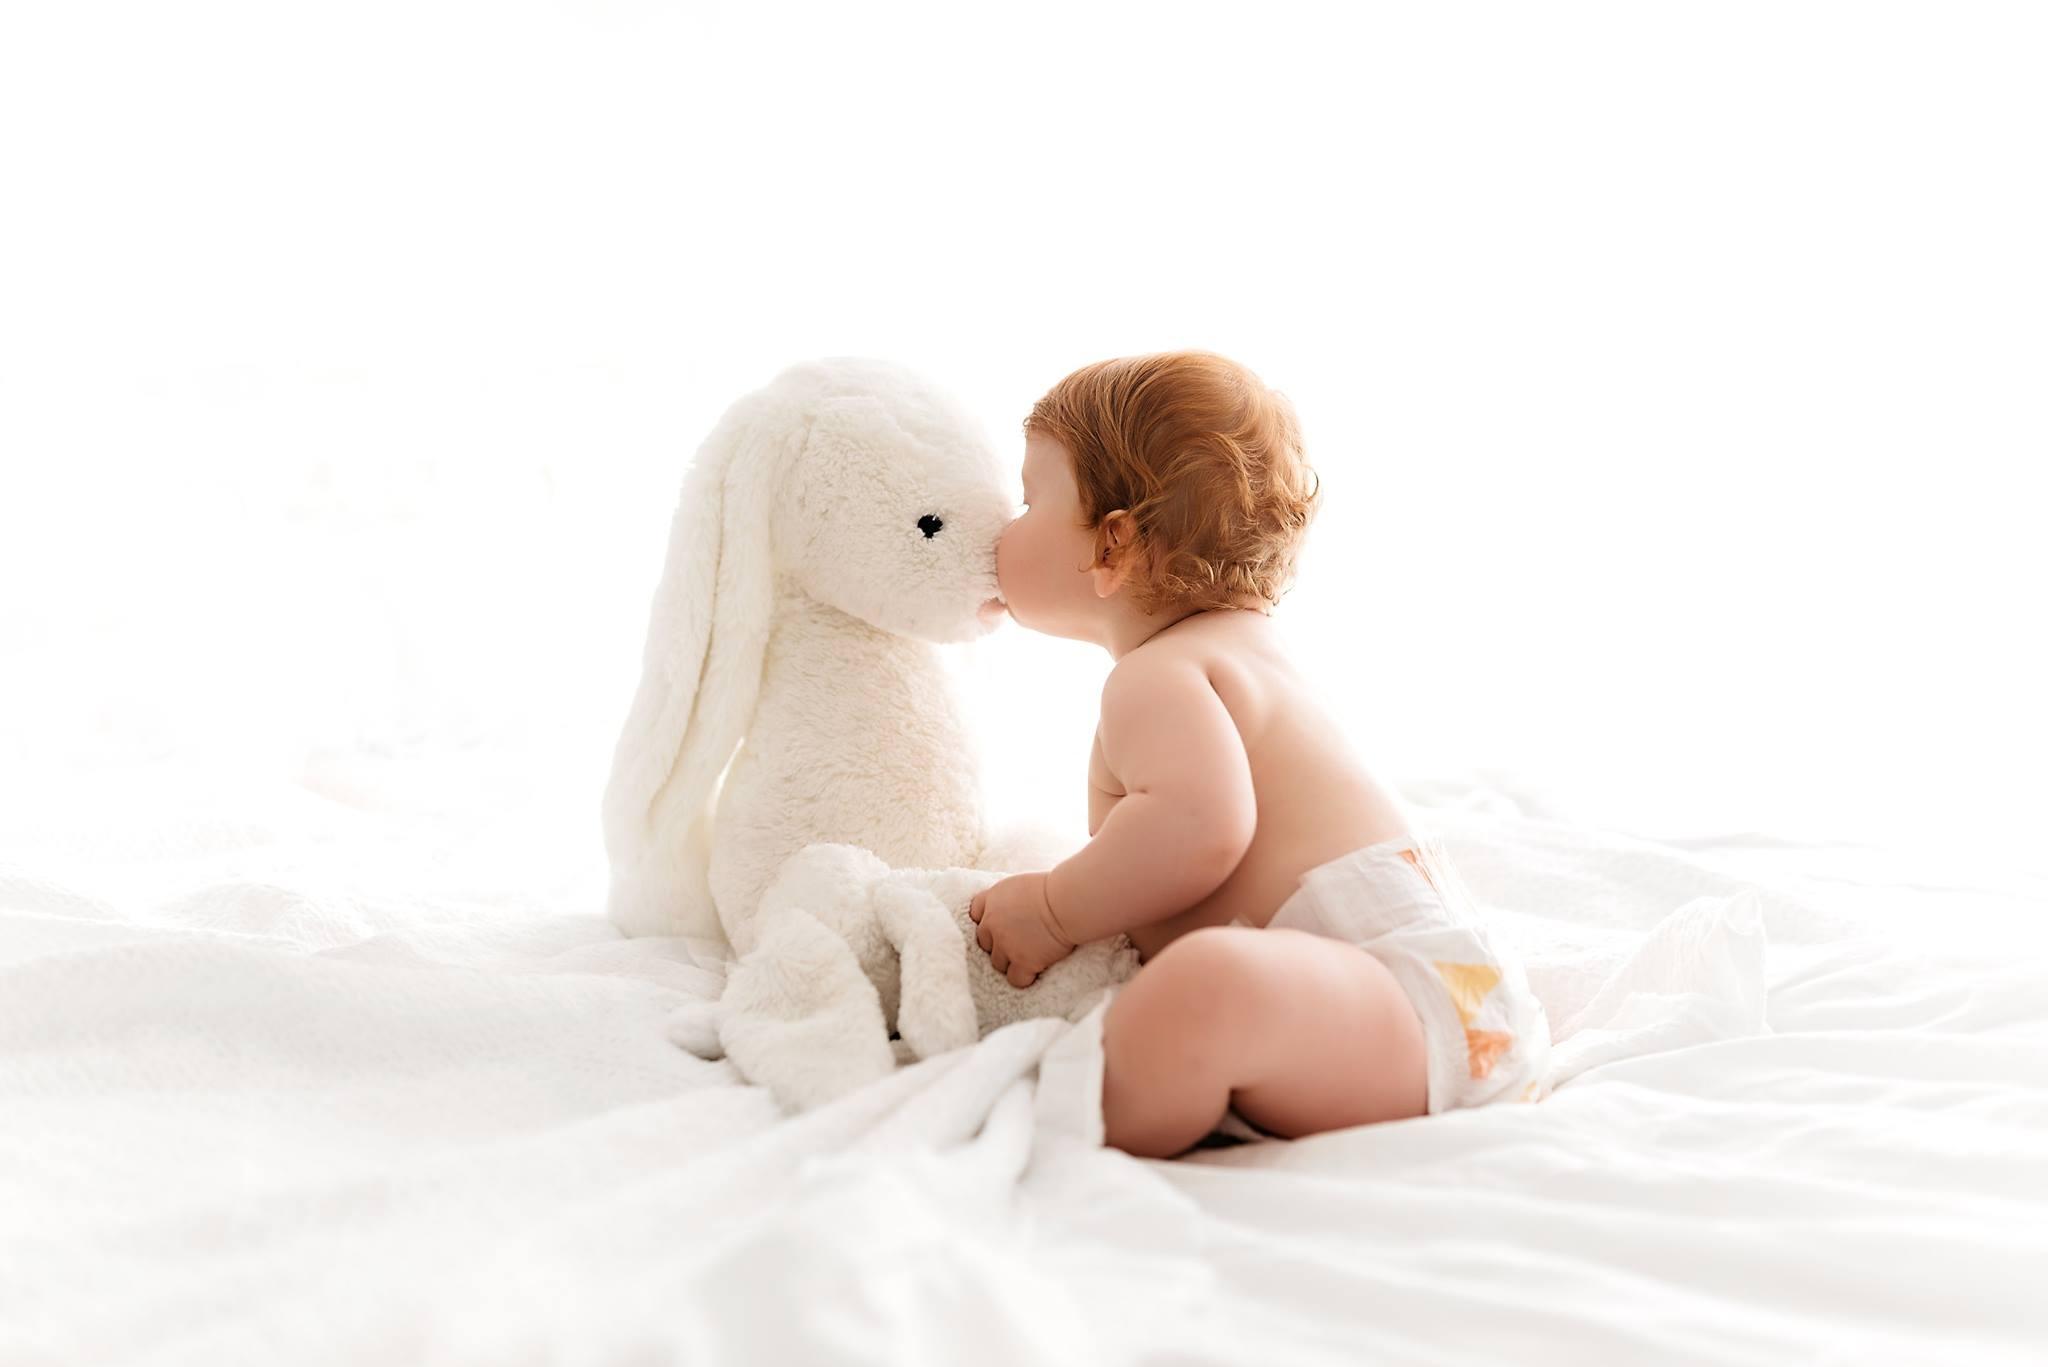 pannolini diapers kit & Kin midi